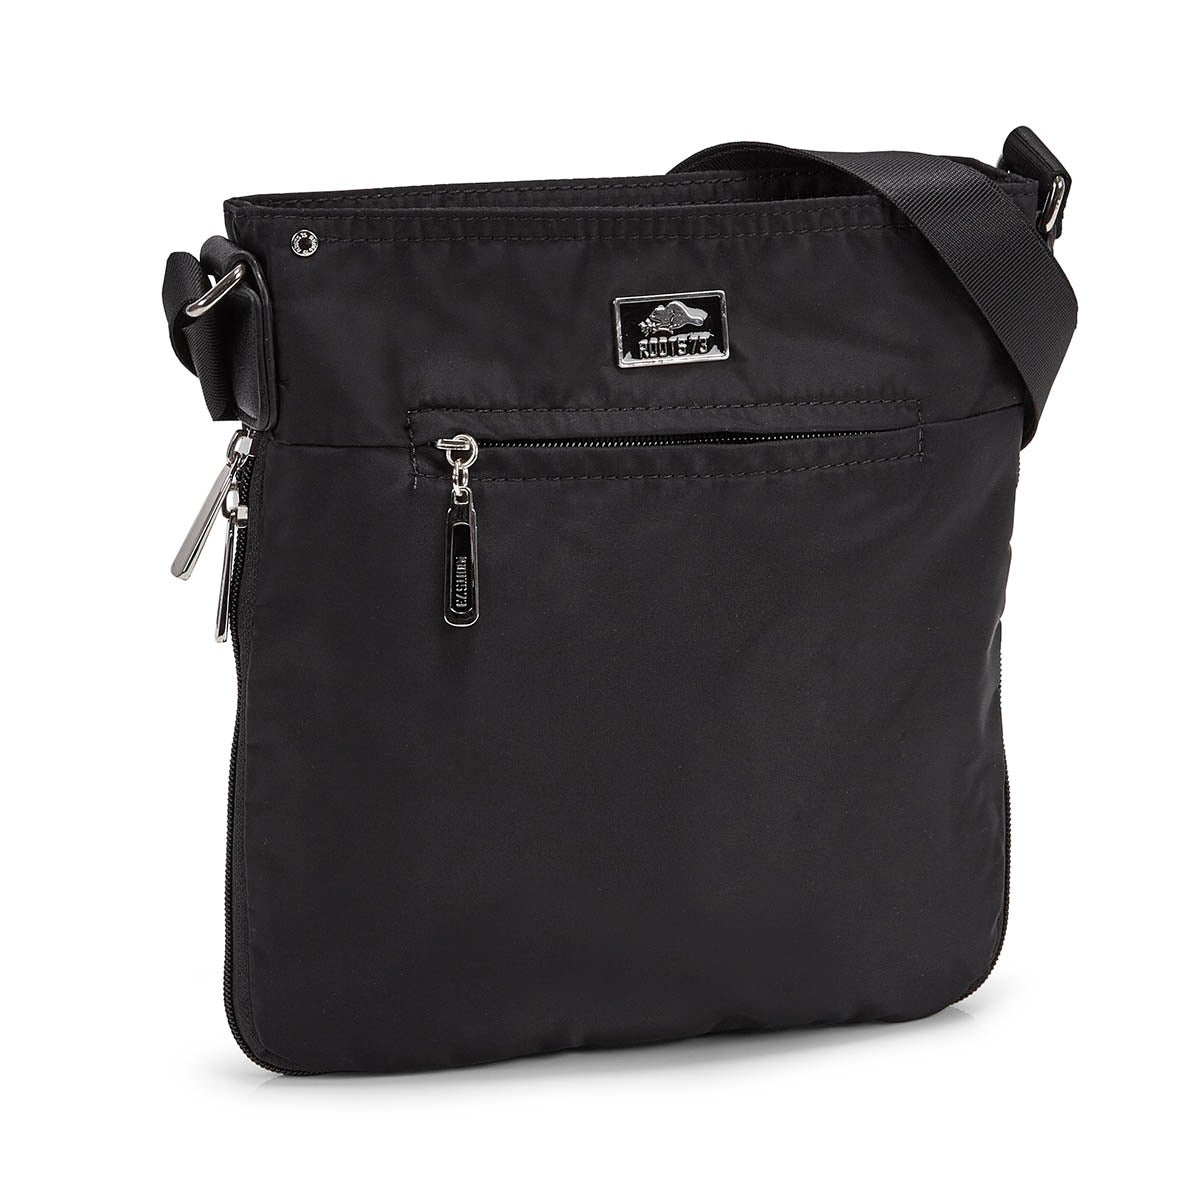 Women's R5136  black north/south cross body bag